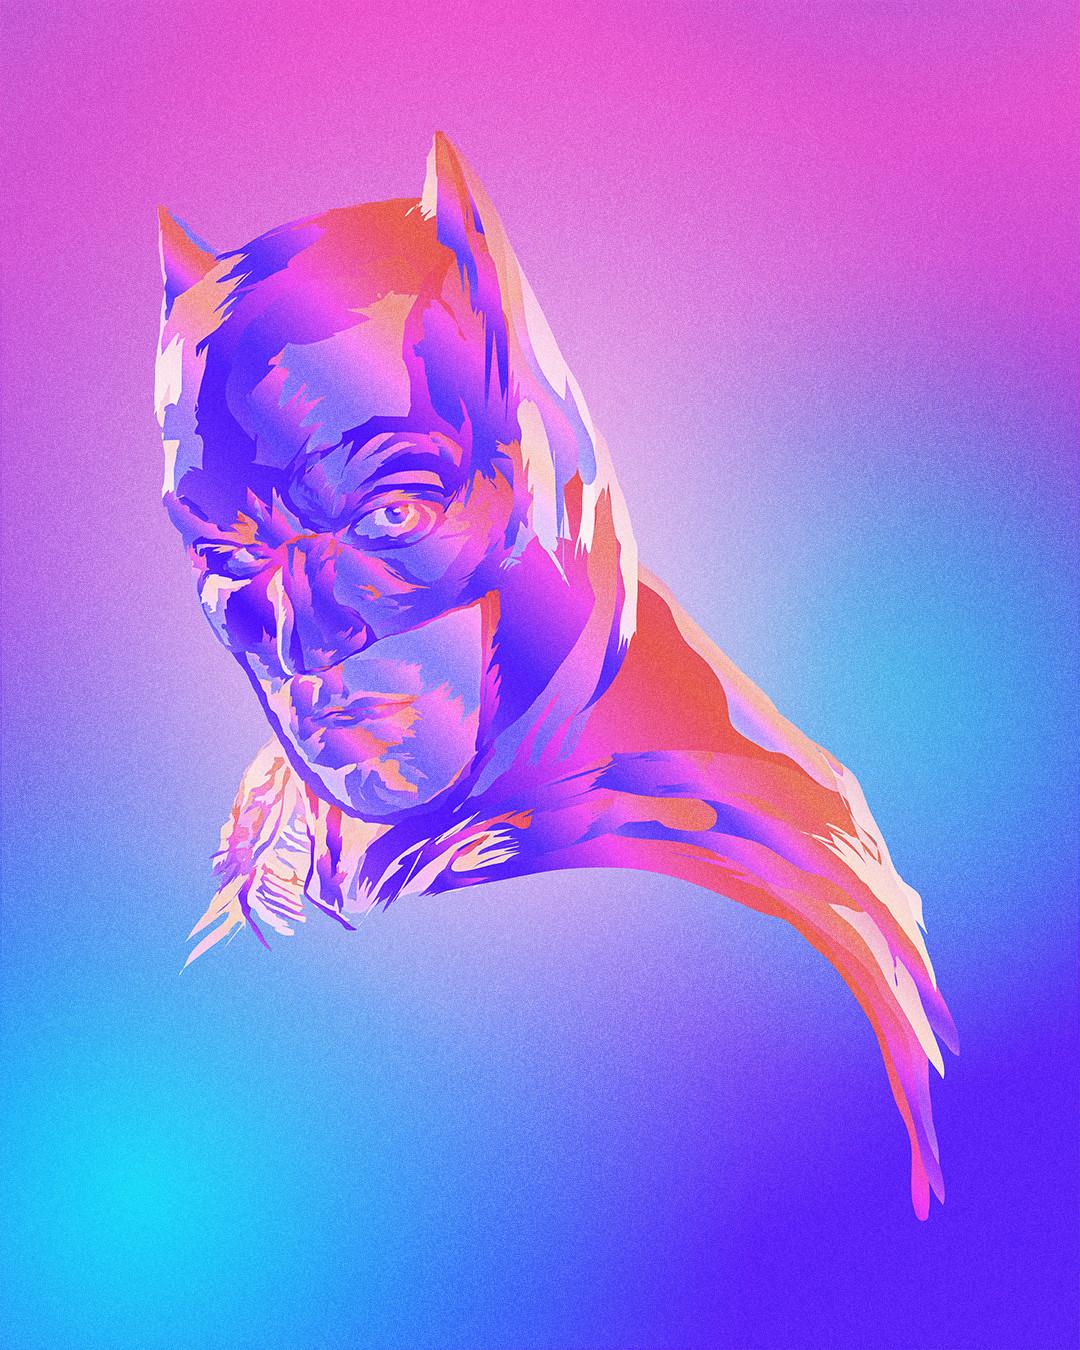 Nick tam full masaolab justiceleague colorillustration batman v1